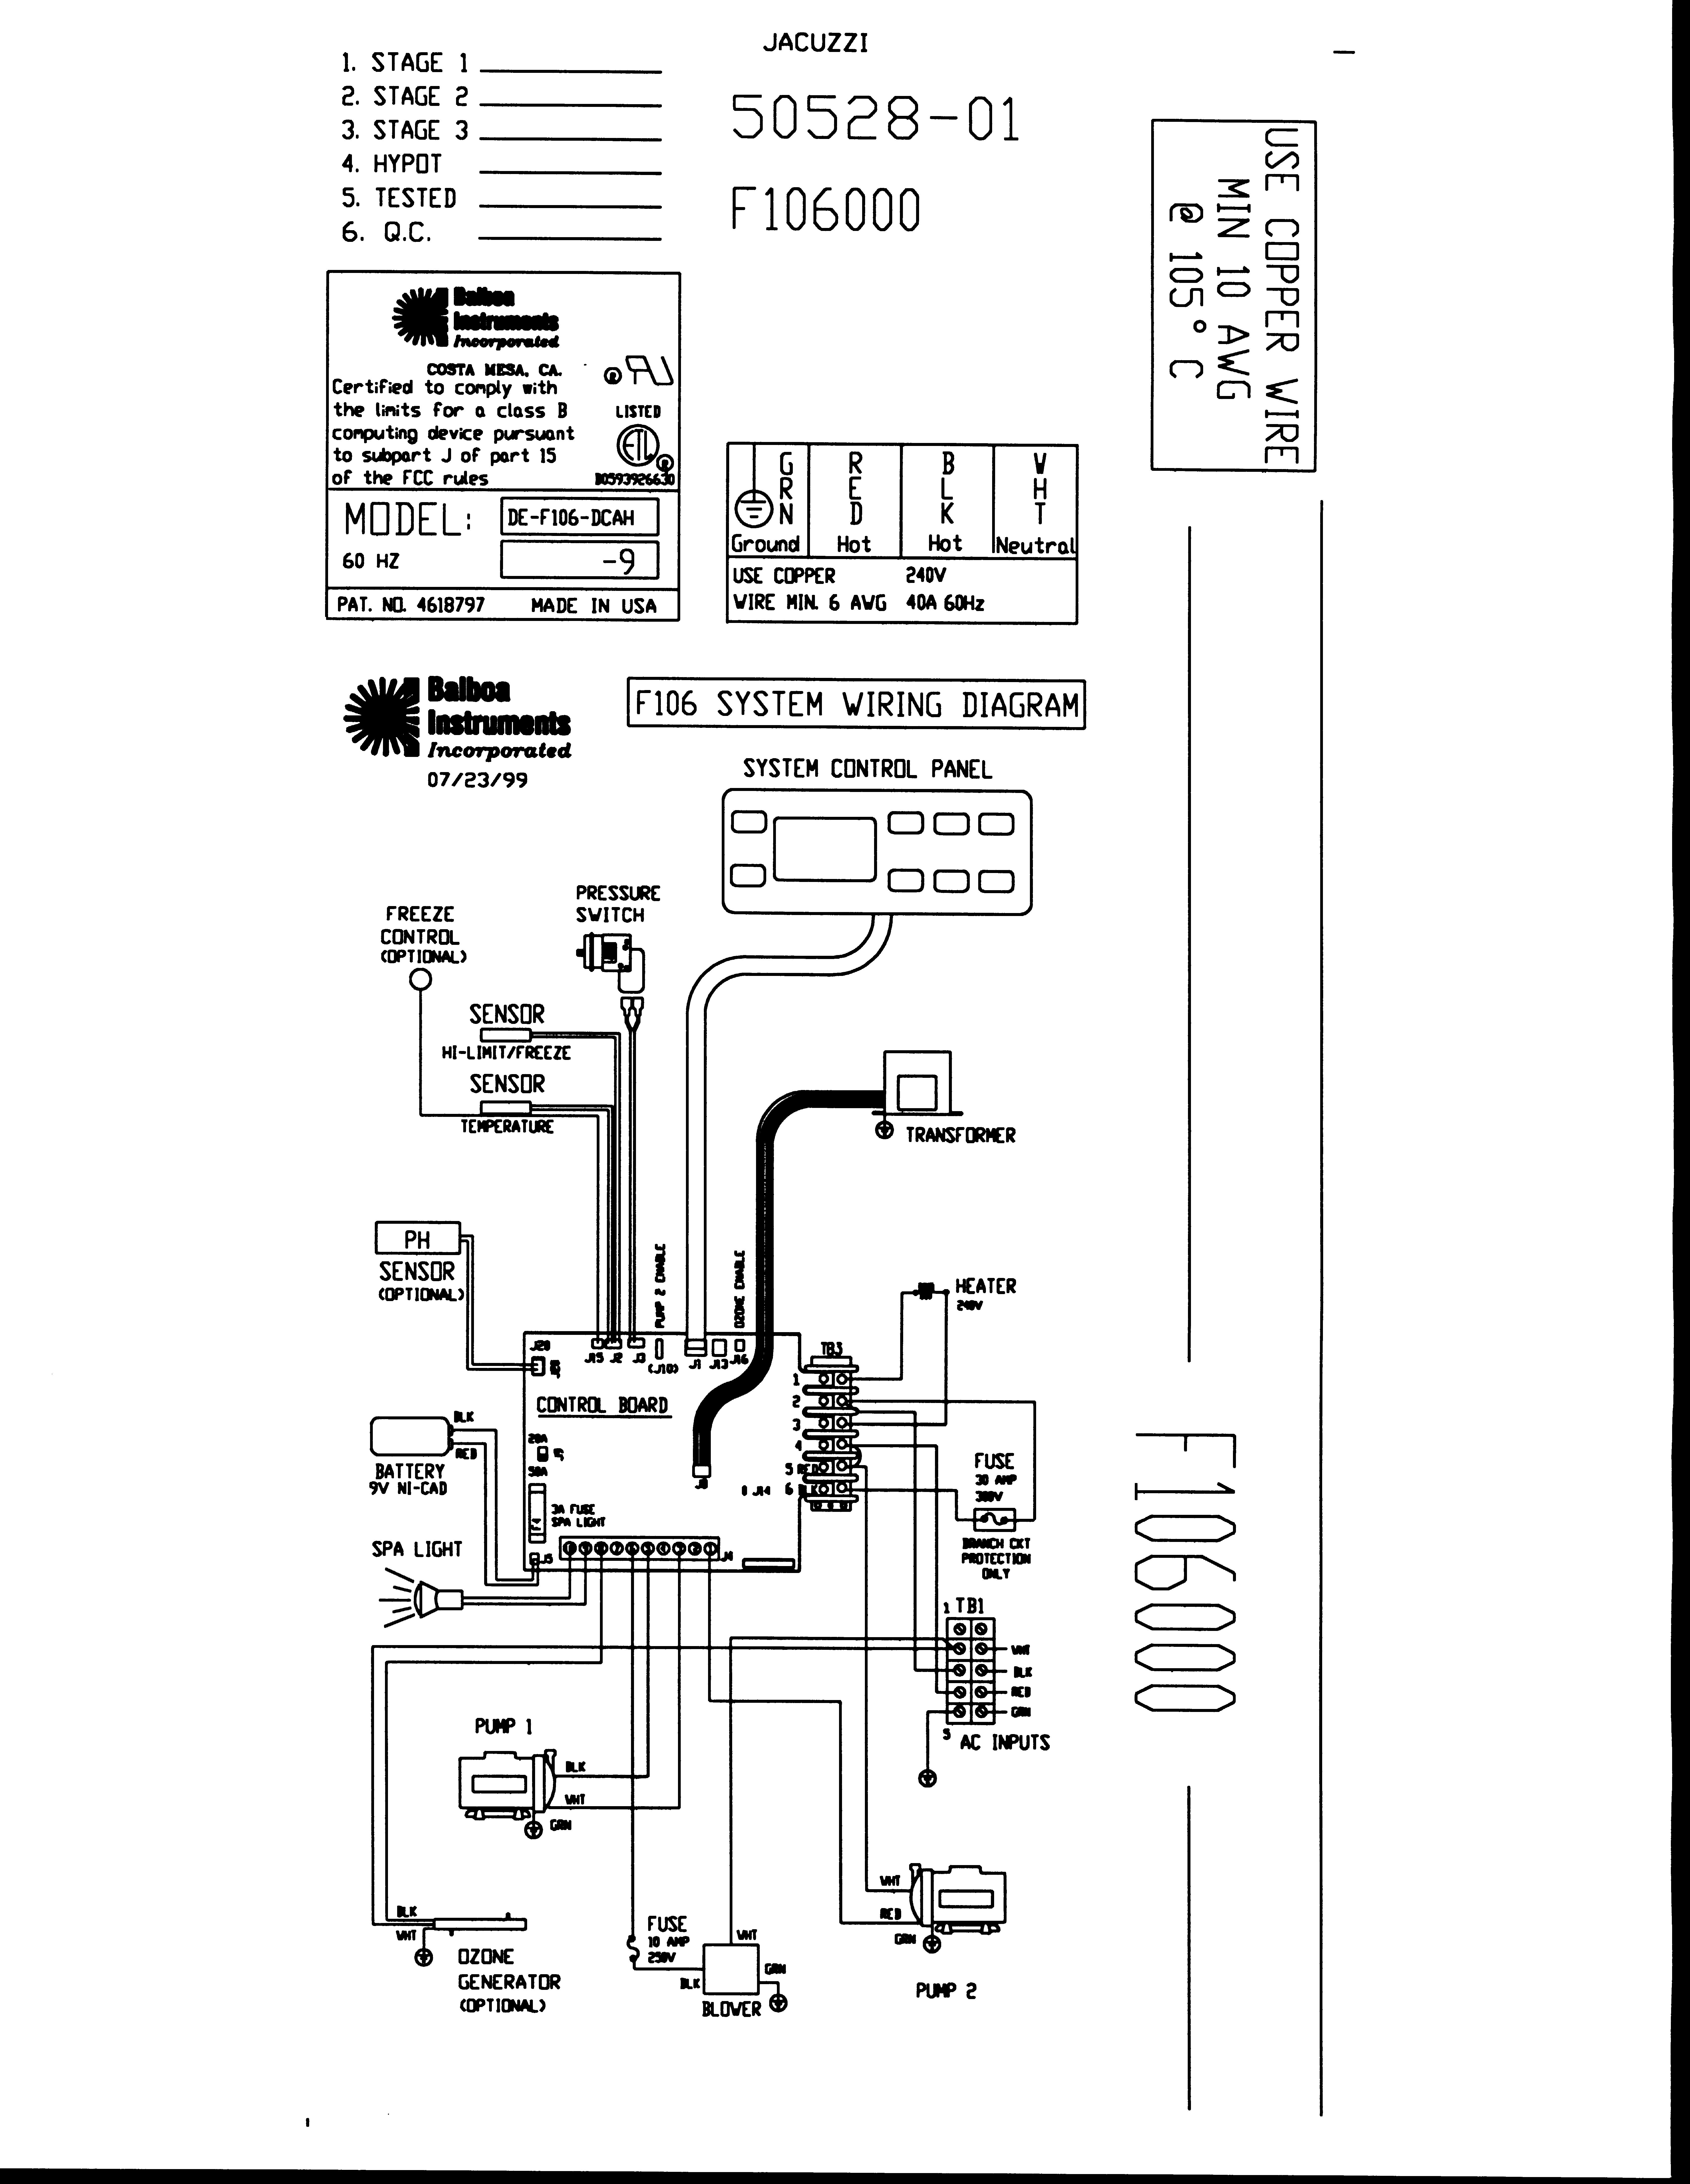 Spa Hydro Quip Wiring Diagram - Harness Kenwood Wiring Kdc 3021 -  landrovers.2020ok-jiwa.jeanjaures37.fr | Hydro Quip Wiring Diagram |  | Wiring Diagram Resource